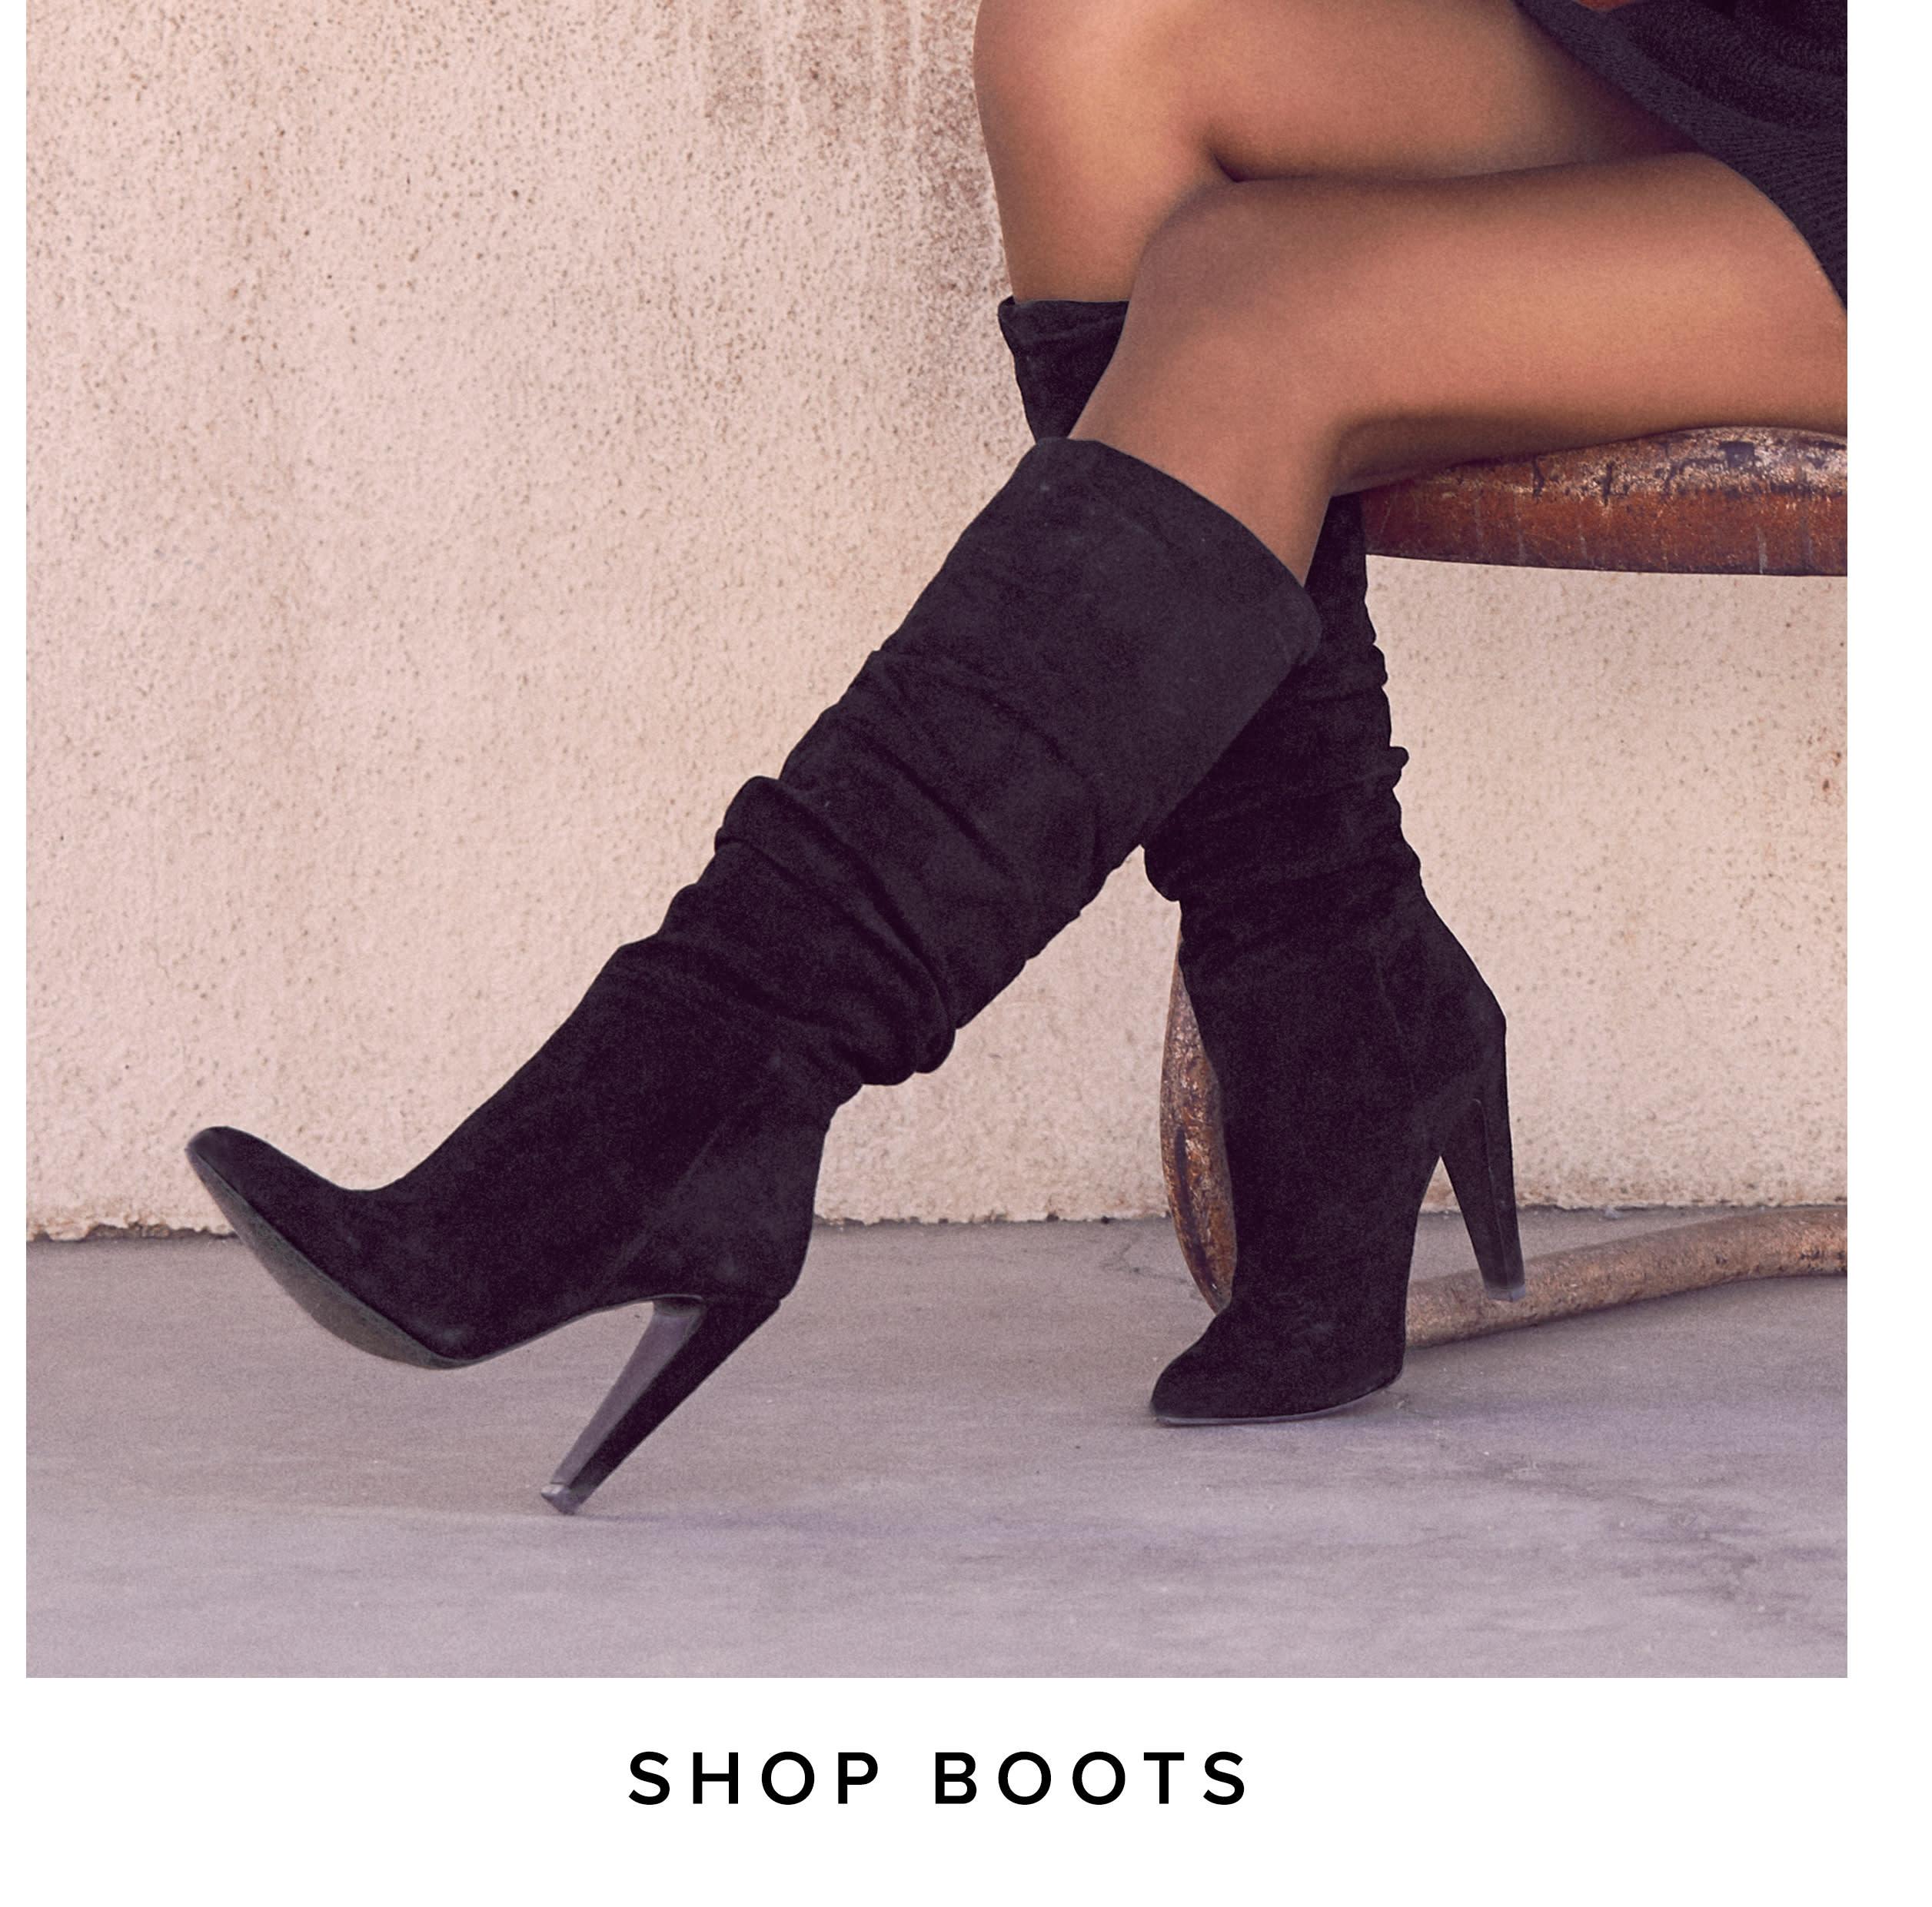 Shop Boots for Women.